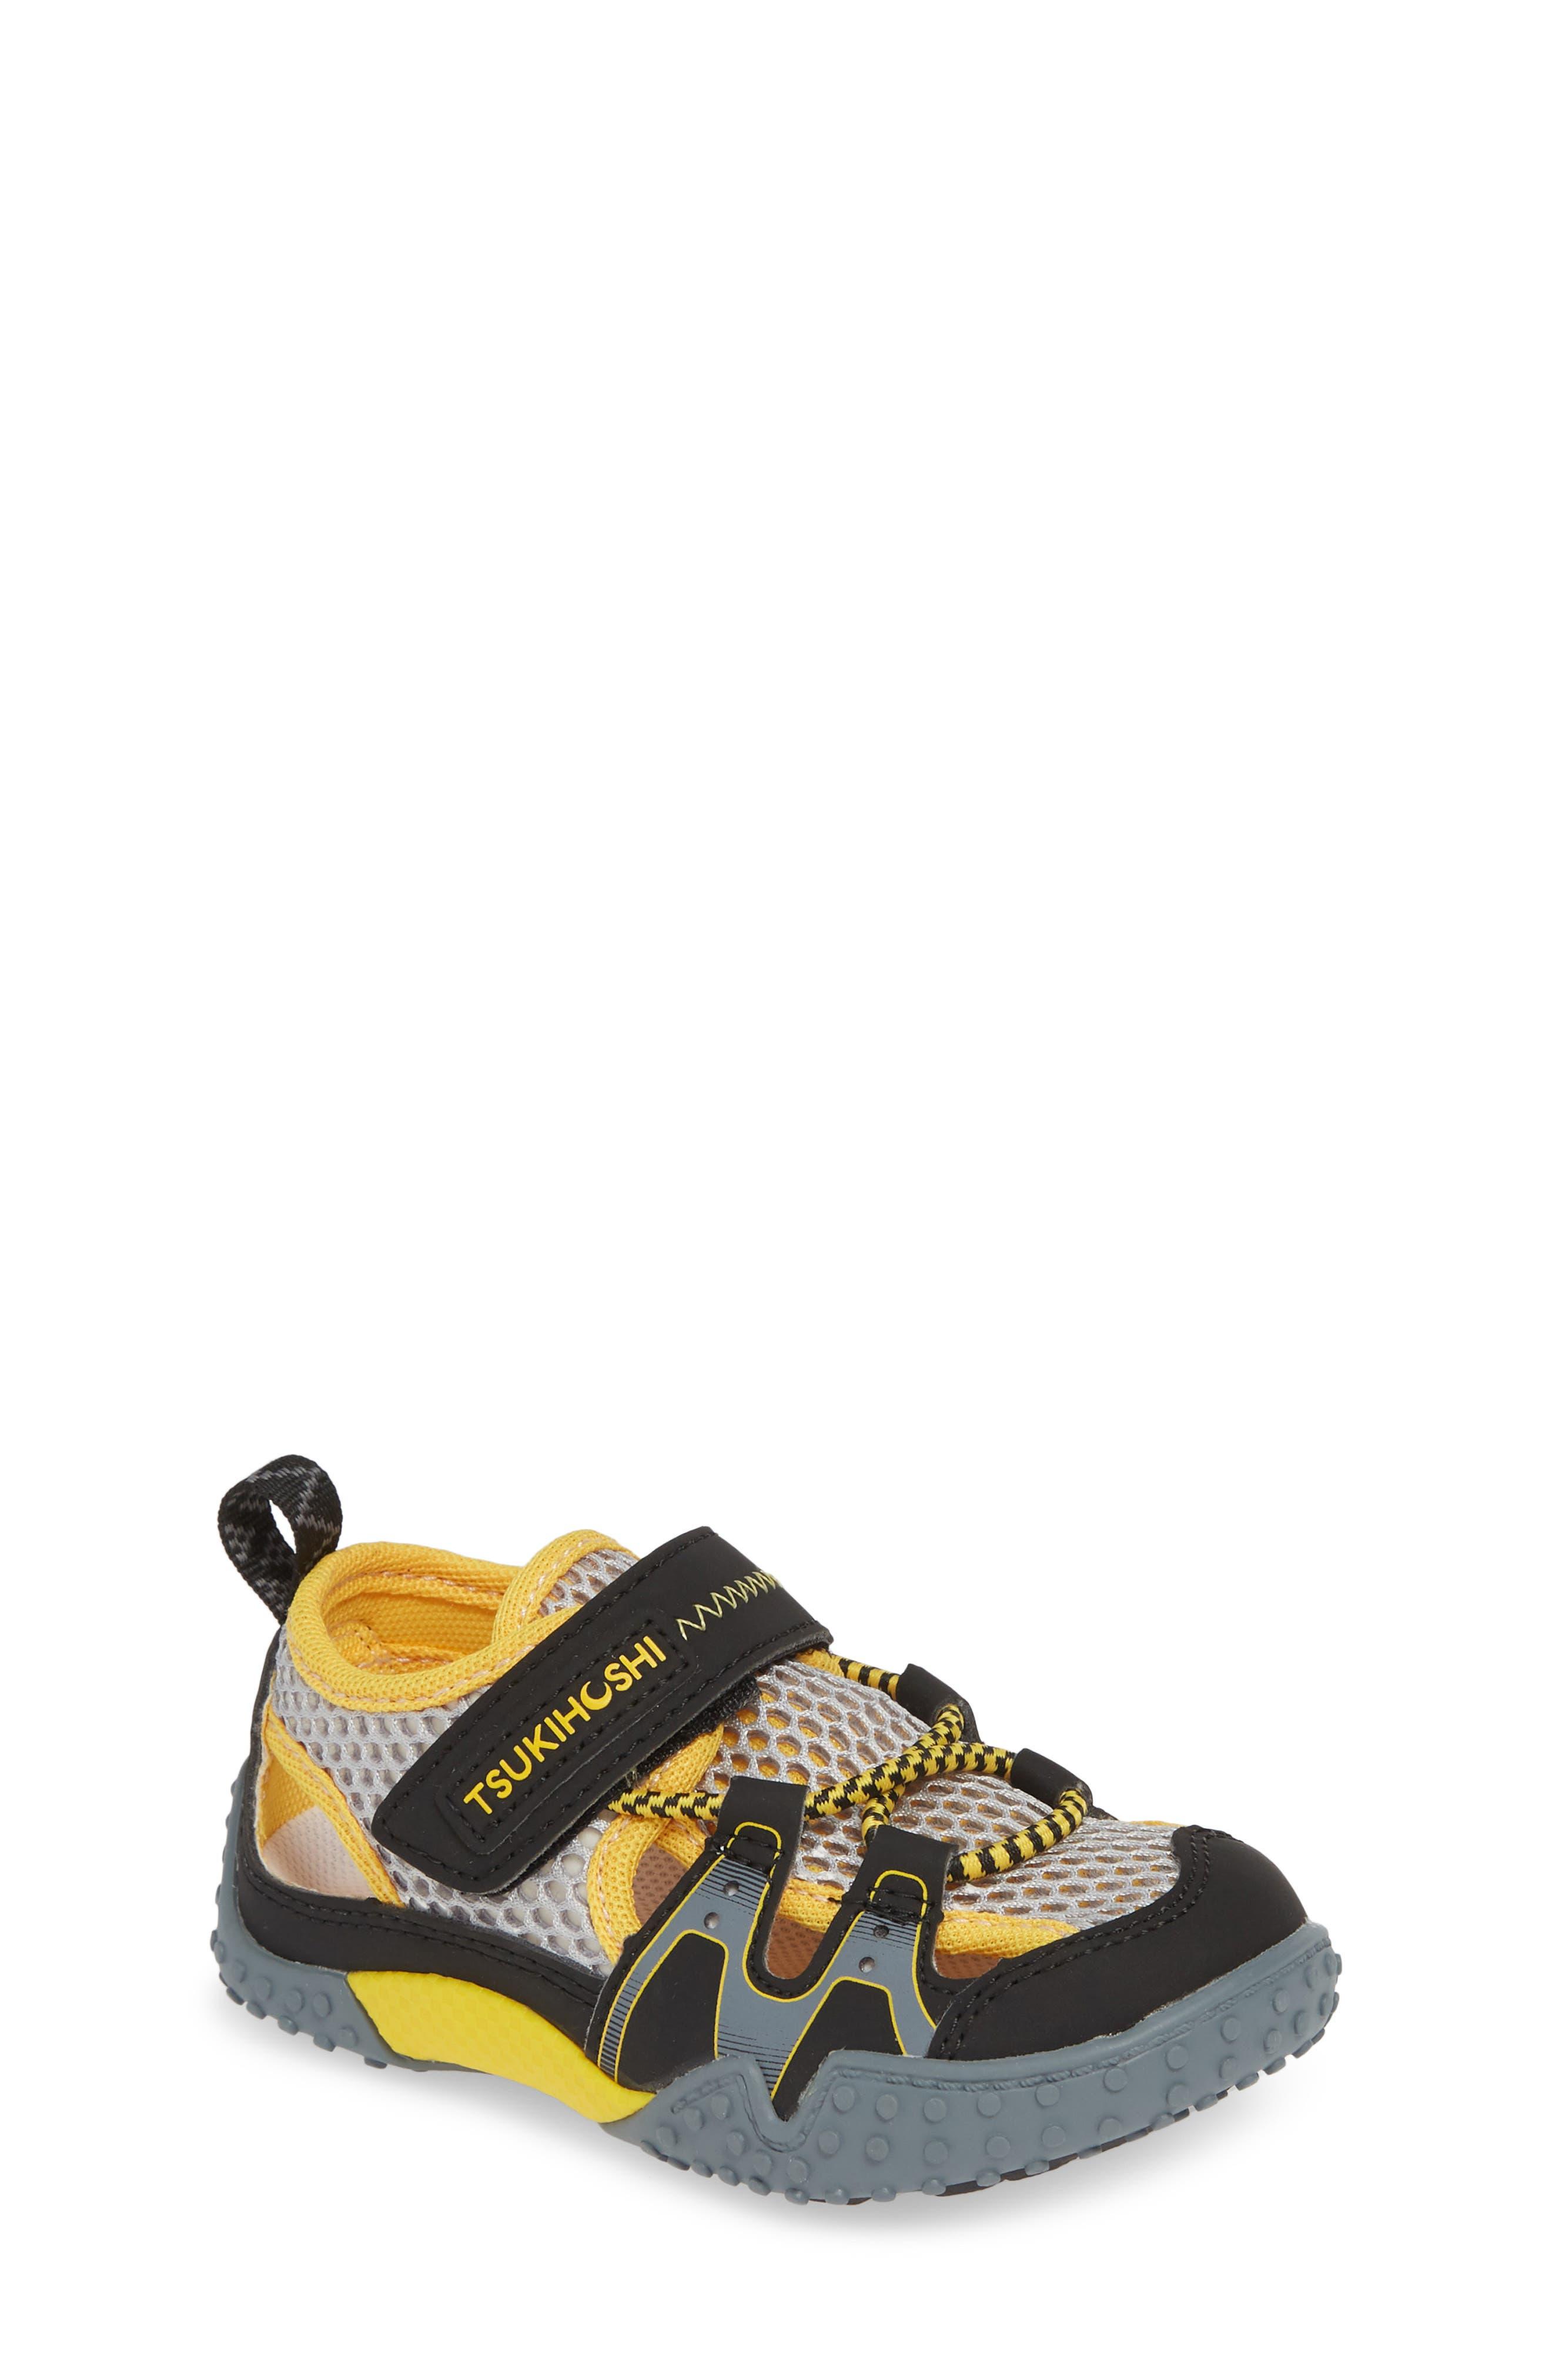 TSUKIHOSHI Ibiza Washable Sandal, Main, color, BLACK/ YELLOW